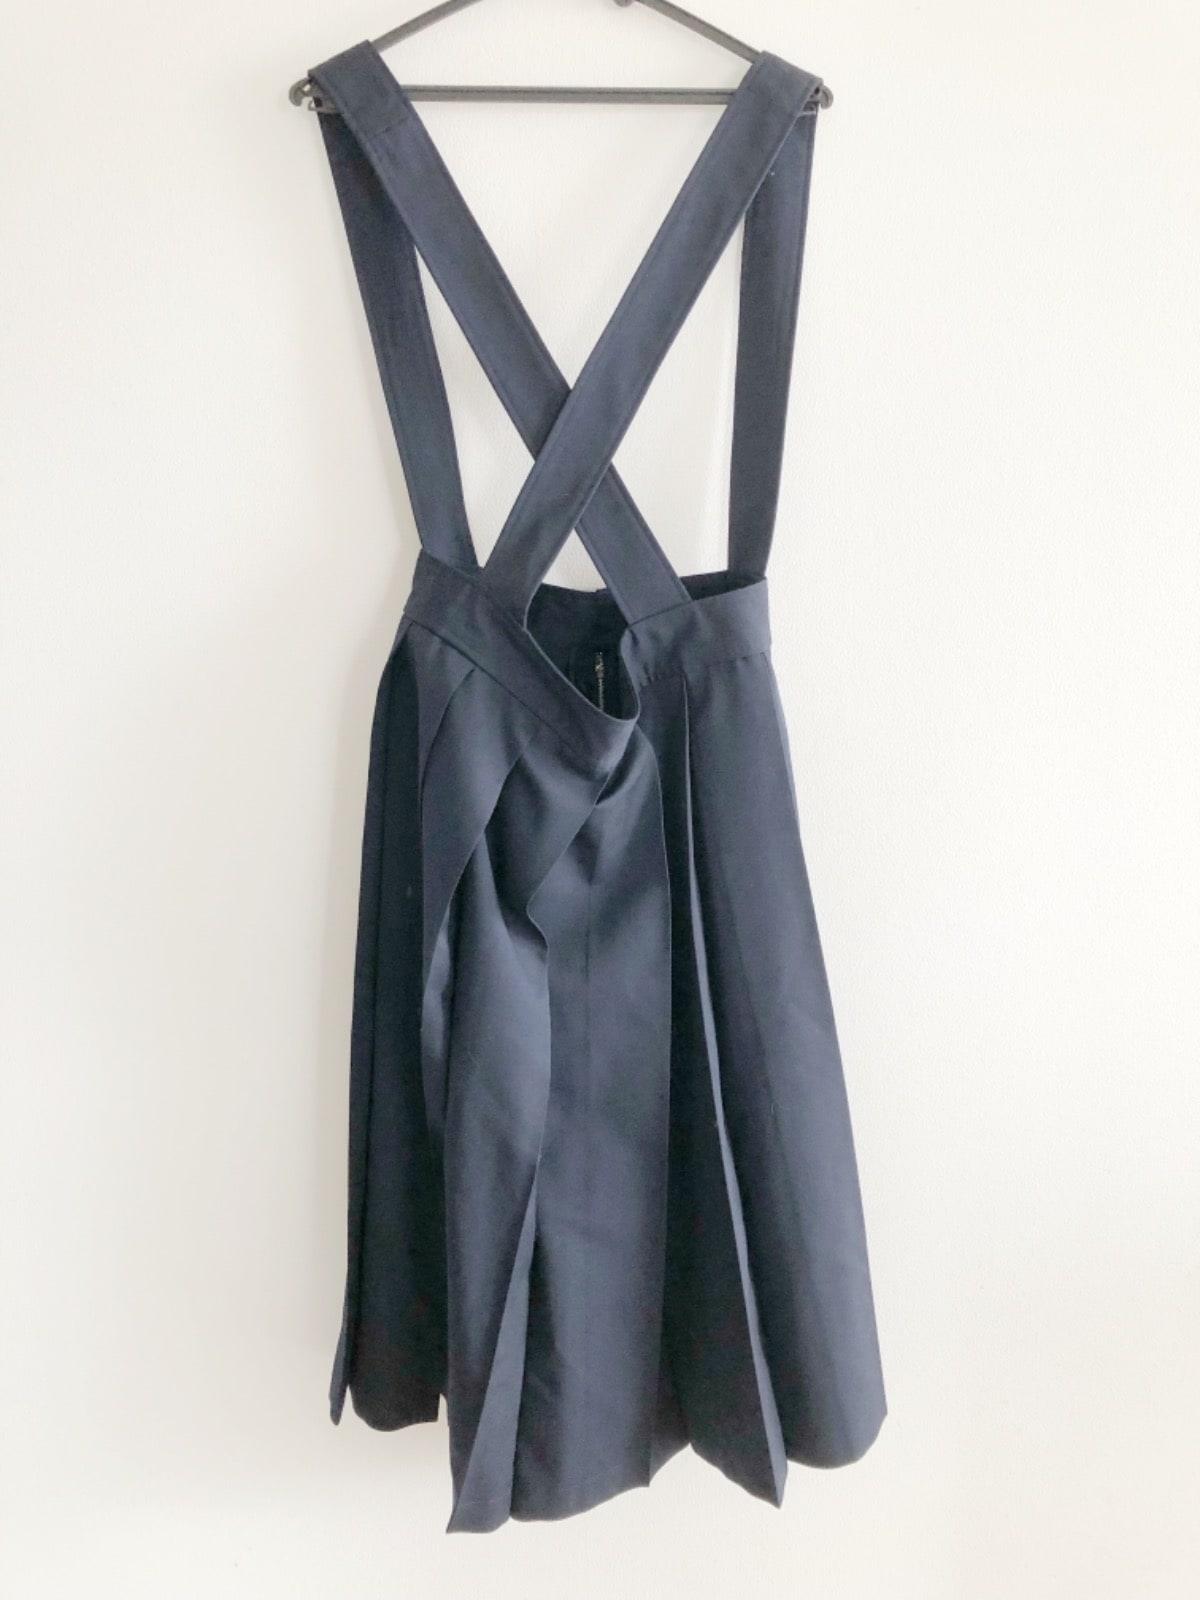 COMME des GARCONS GIRL(コムデギャルソンガール)のスカート